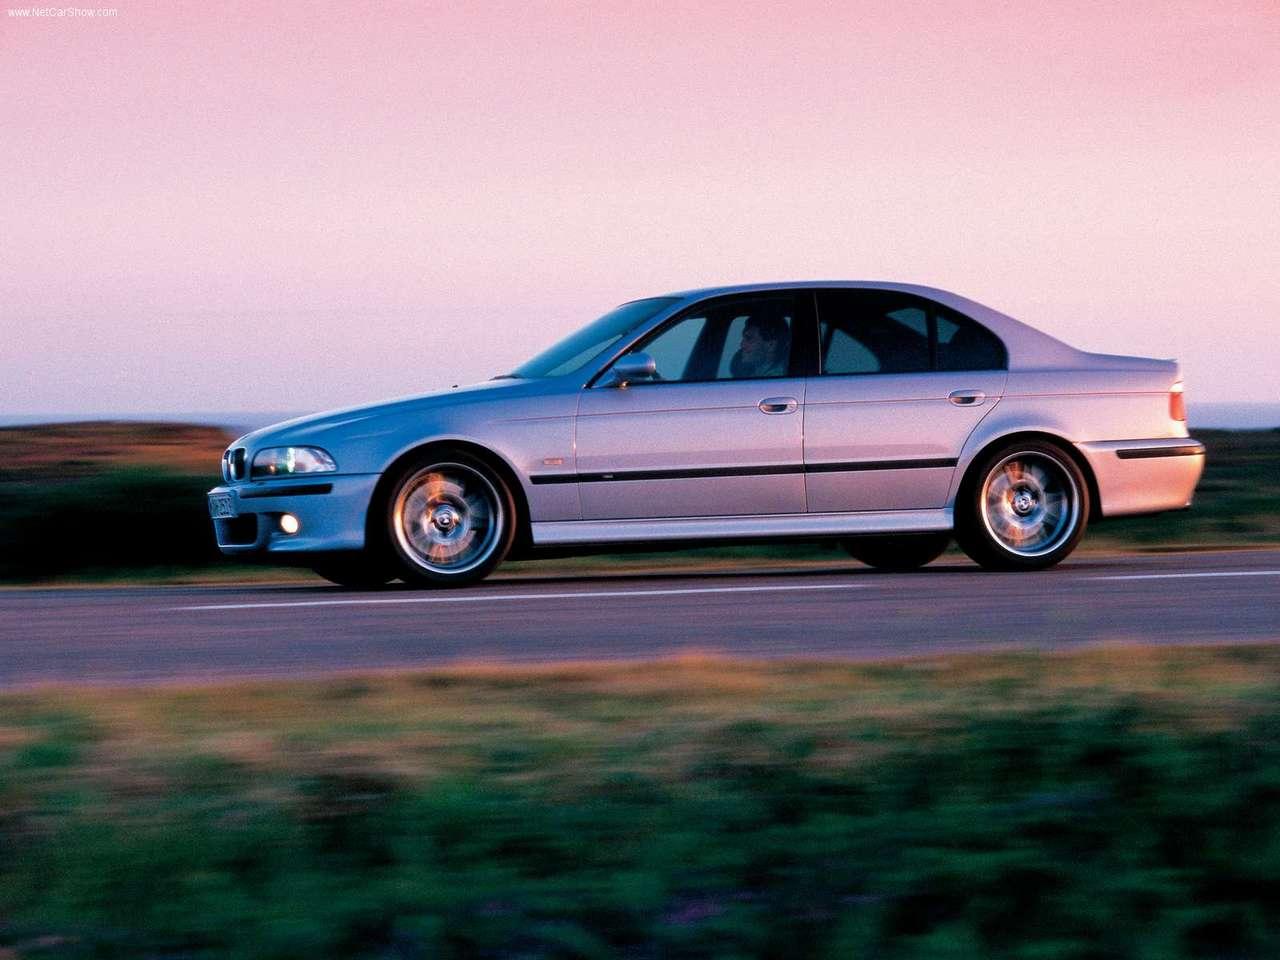 http://4.bp.blogspot.com/_xhqjRo6NERQ/S68mBgYABpI/AAAAAAAAGdc/jk5E98f9R_0/s1600/BMW-M5_2001_1280x960_wallpaper_04.jpg